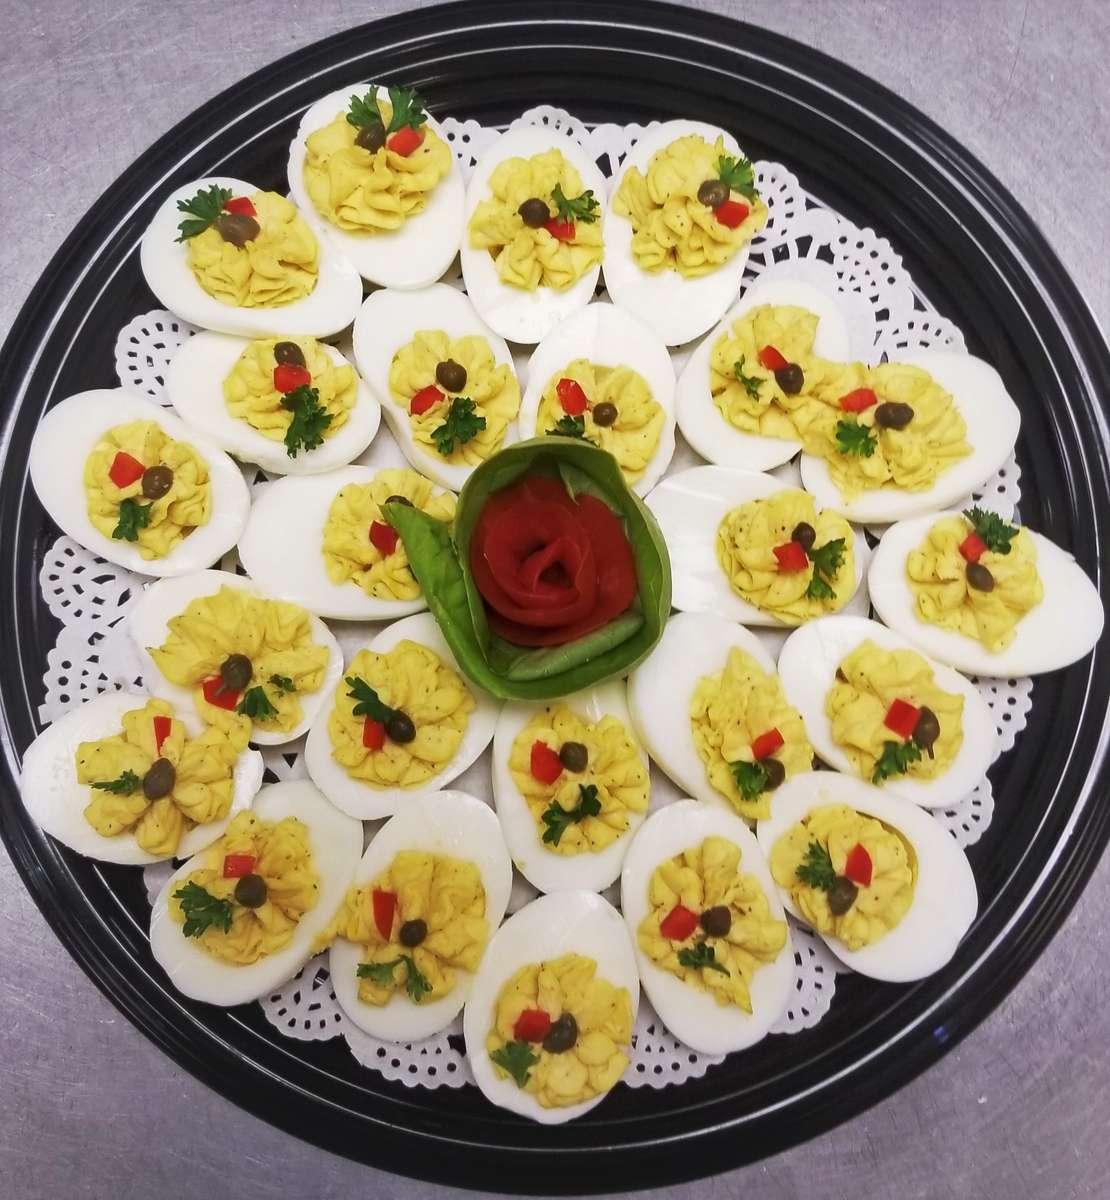 Stuffed Deviled Eggs